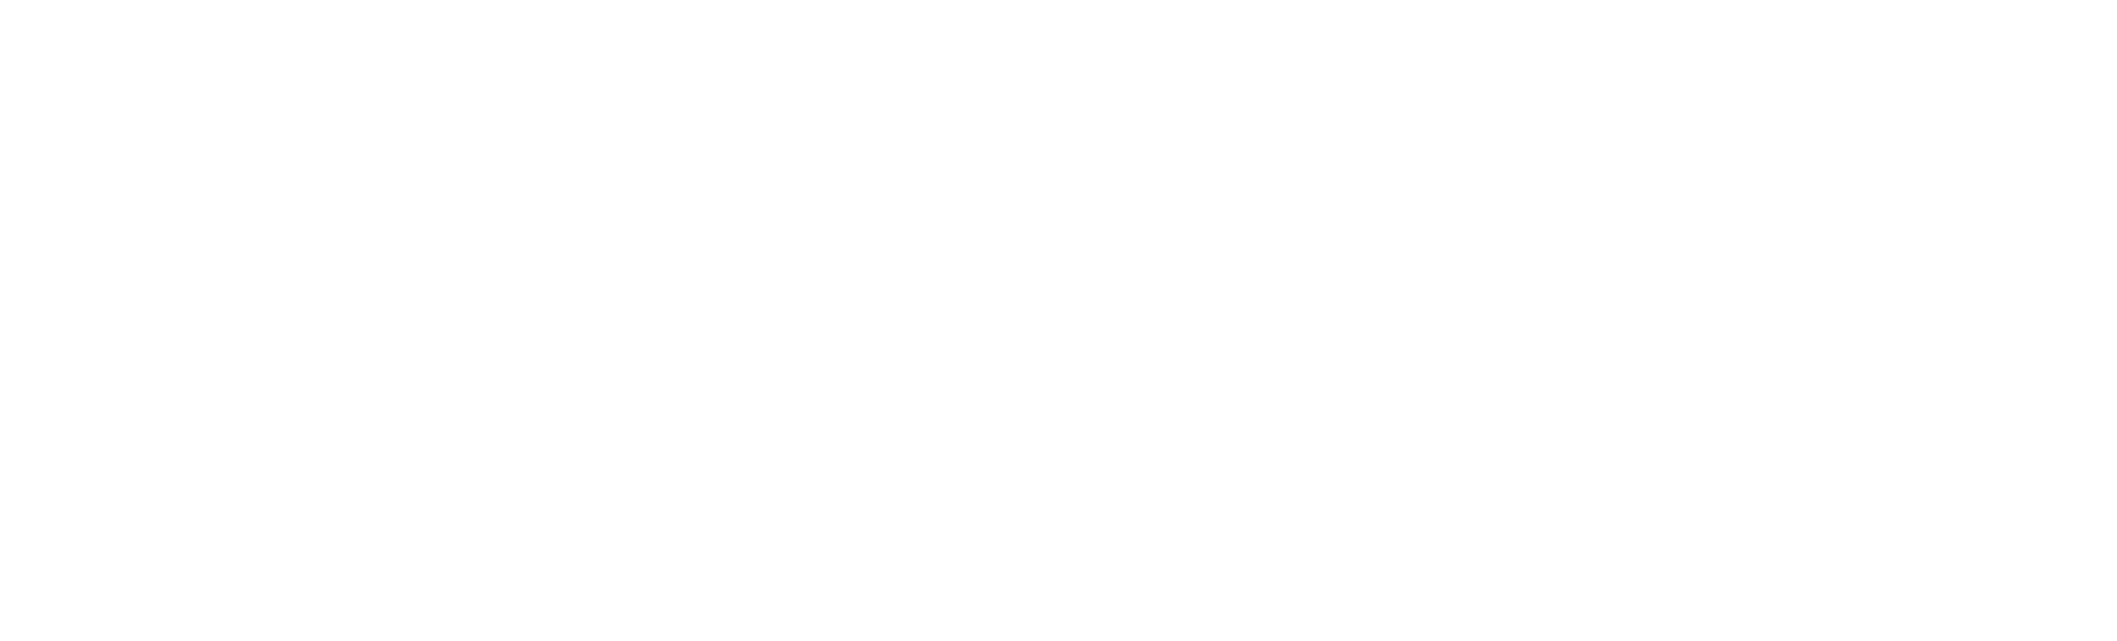 TU Delft Debating Club